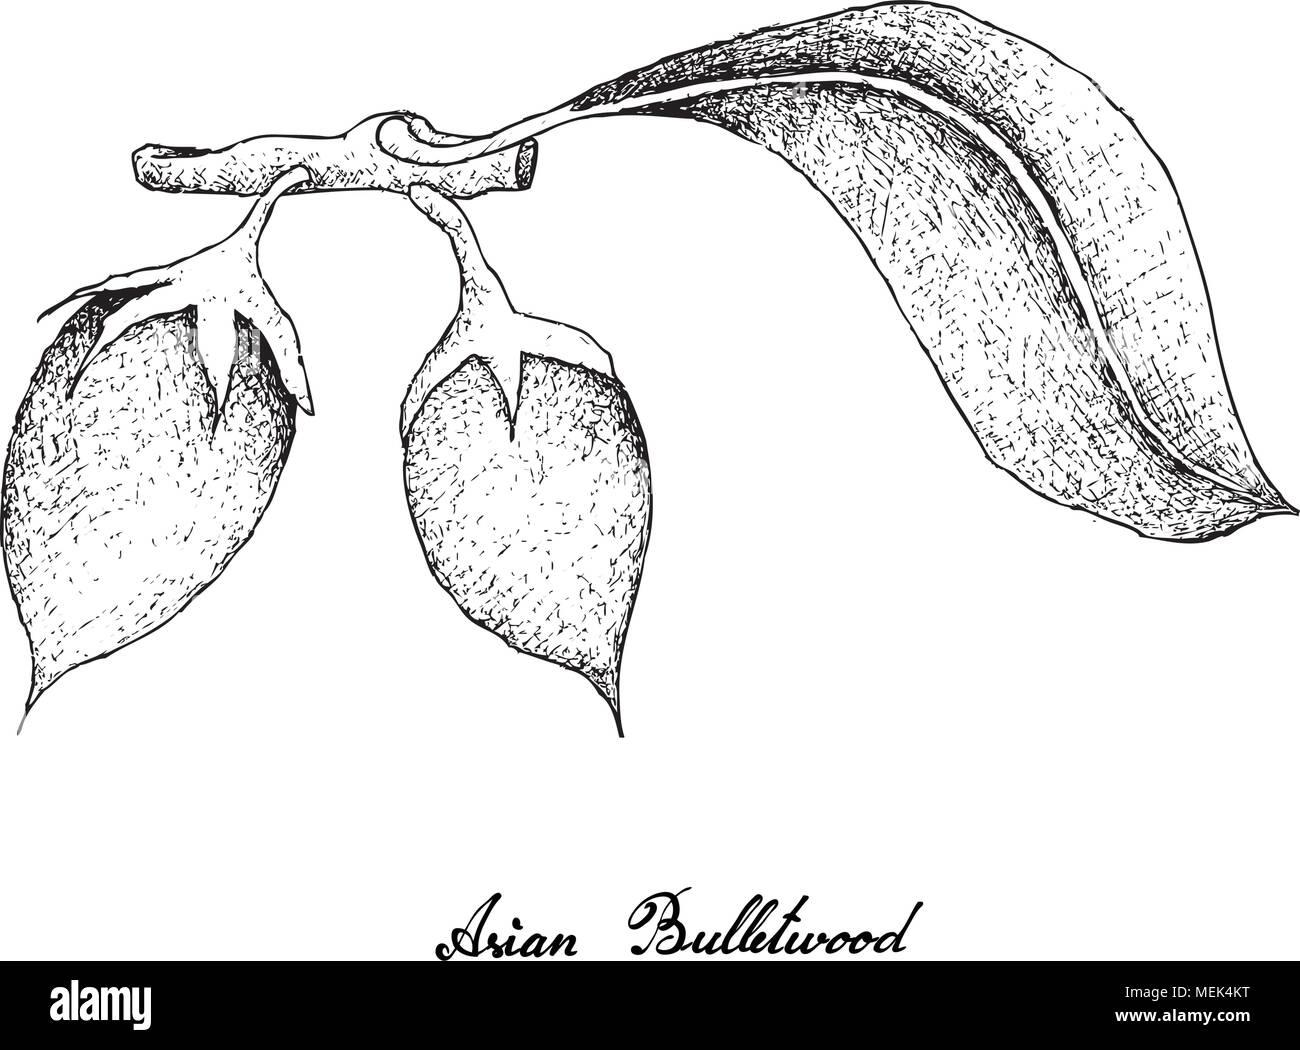 Tropical fruits illustration of hand drawn sketch asian bulletwood bukal tanjong tree medlar spanish cherry and mimusops elengi fruit isolated on